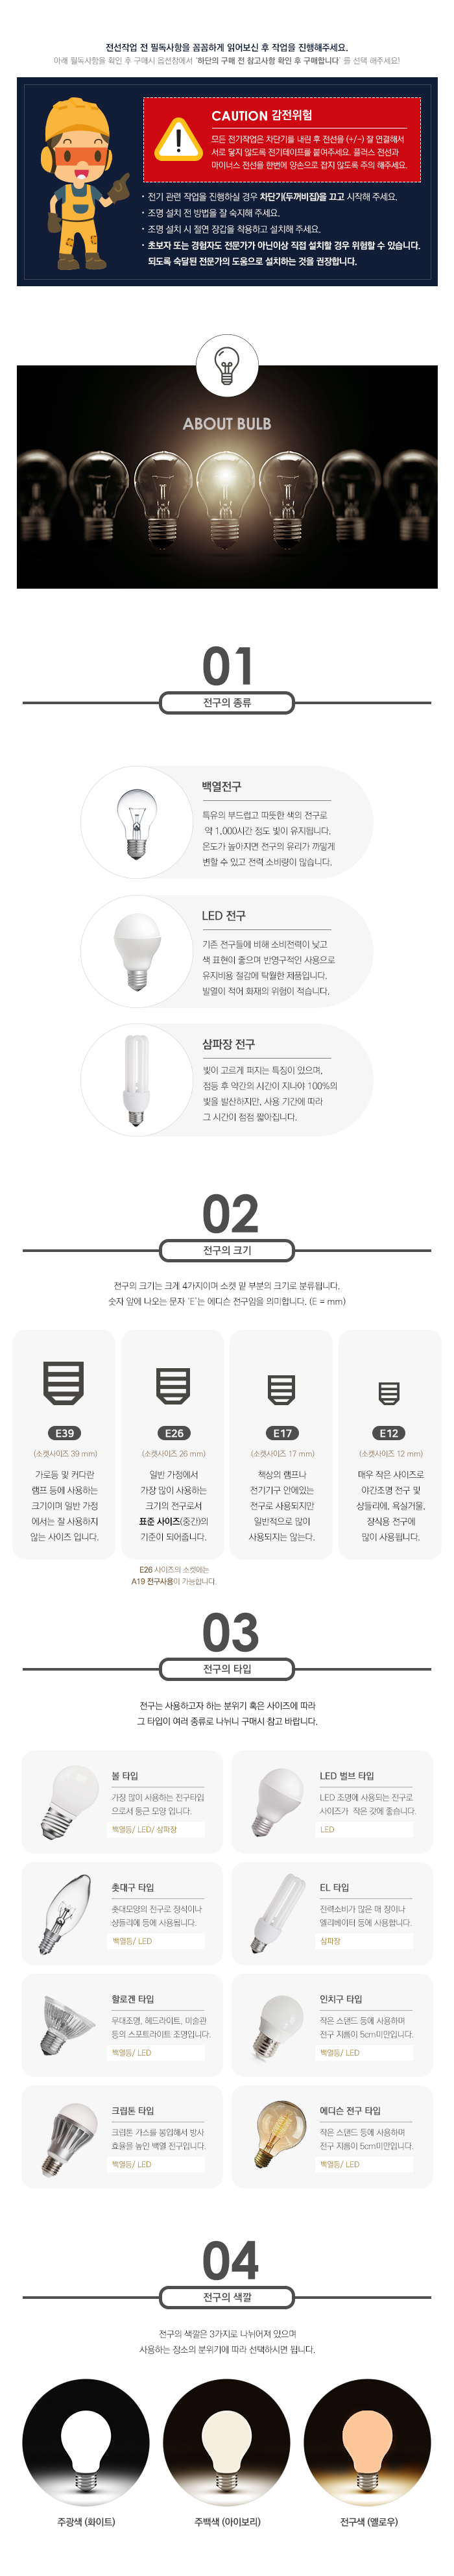 About_Bulb.jpg